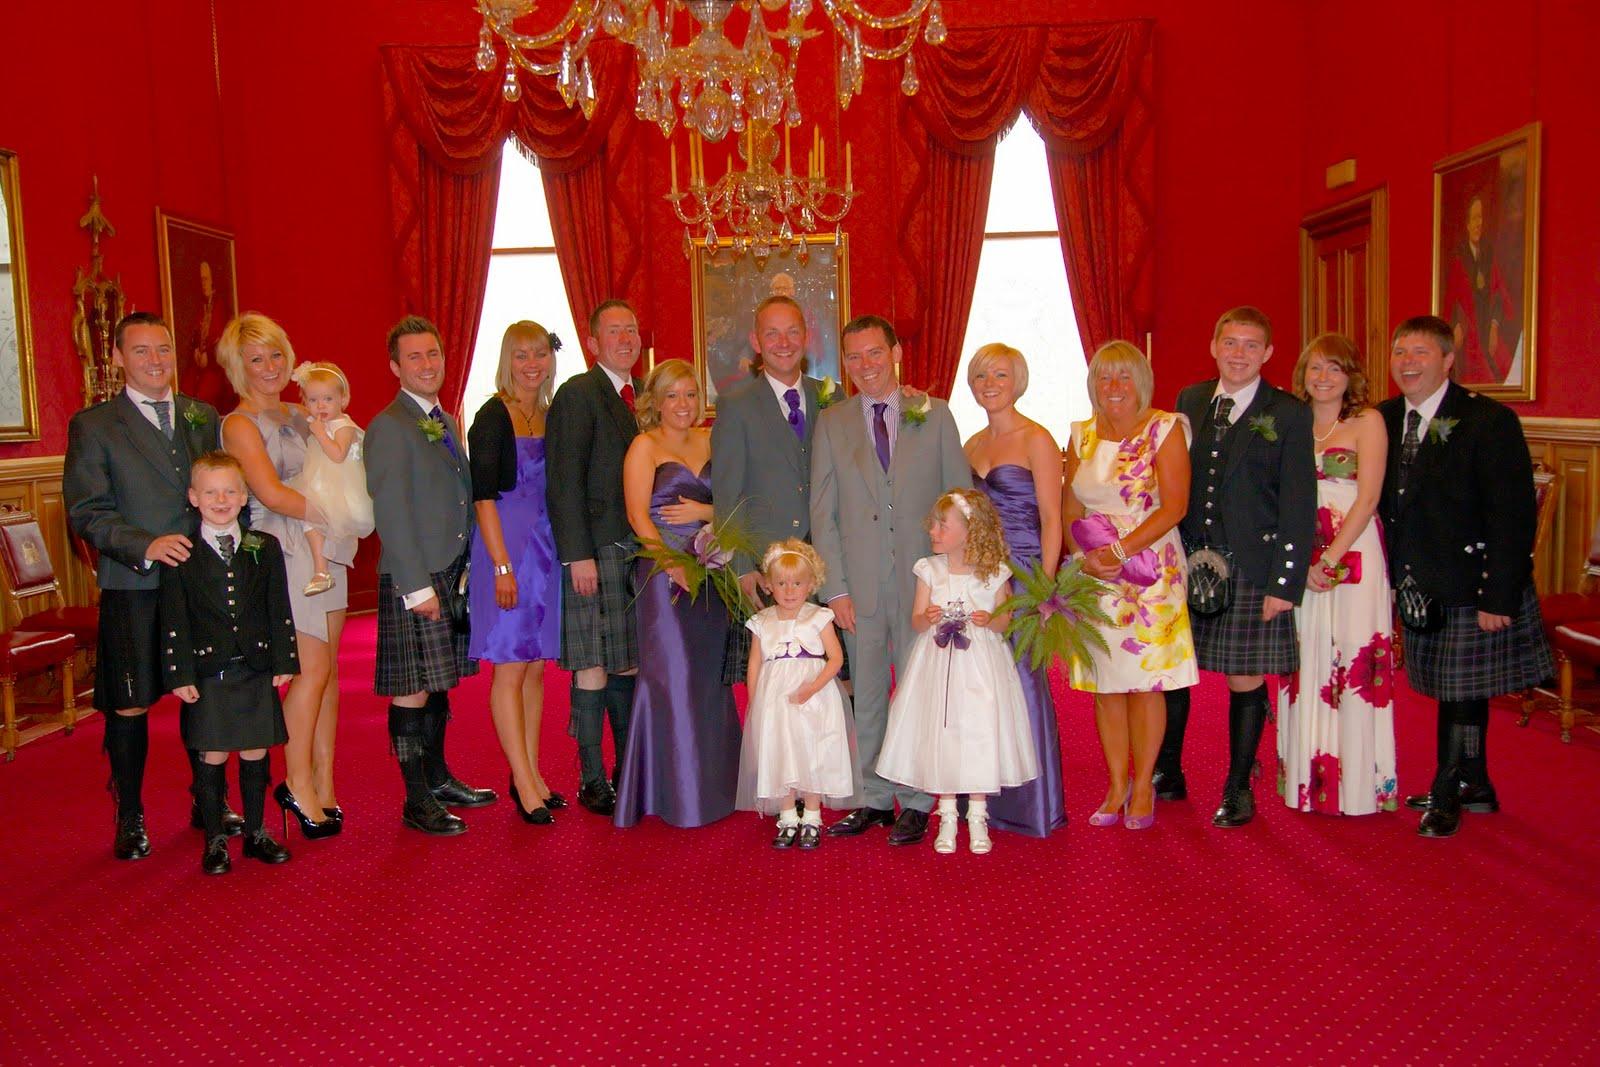 wedding photography scotland janie barclay wedding